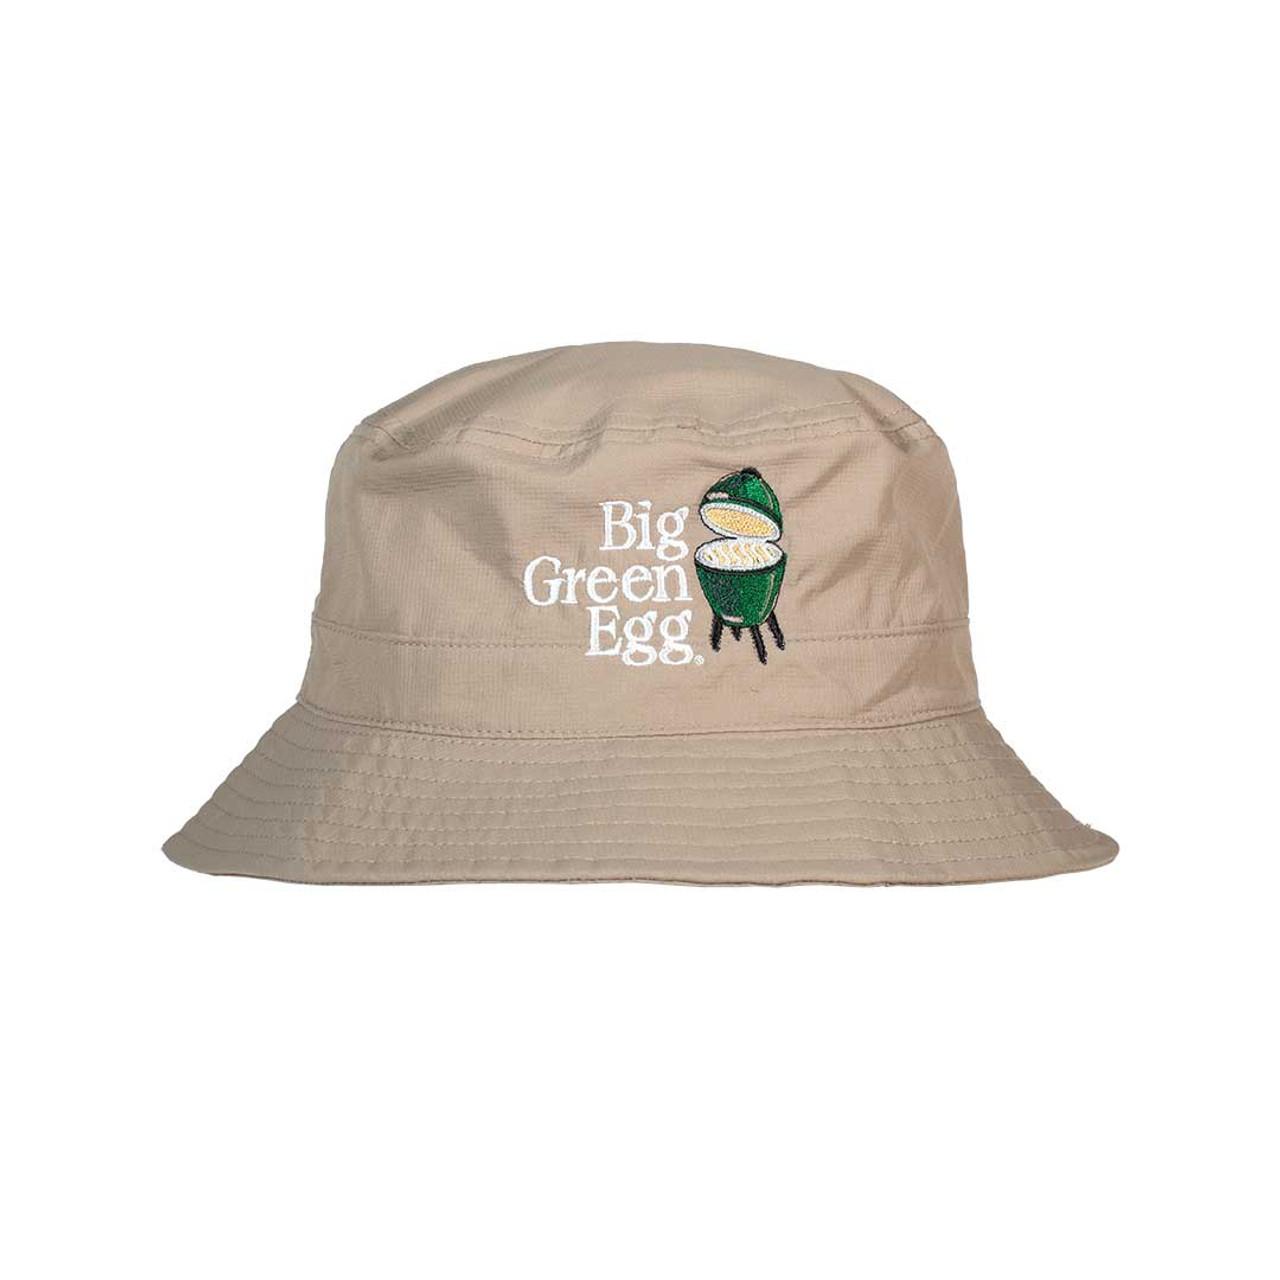 Big Green Egg Bucket Hat – Khaki - front view